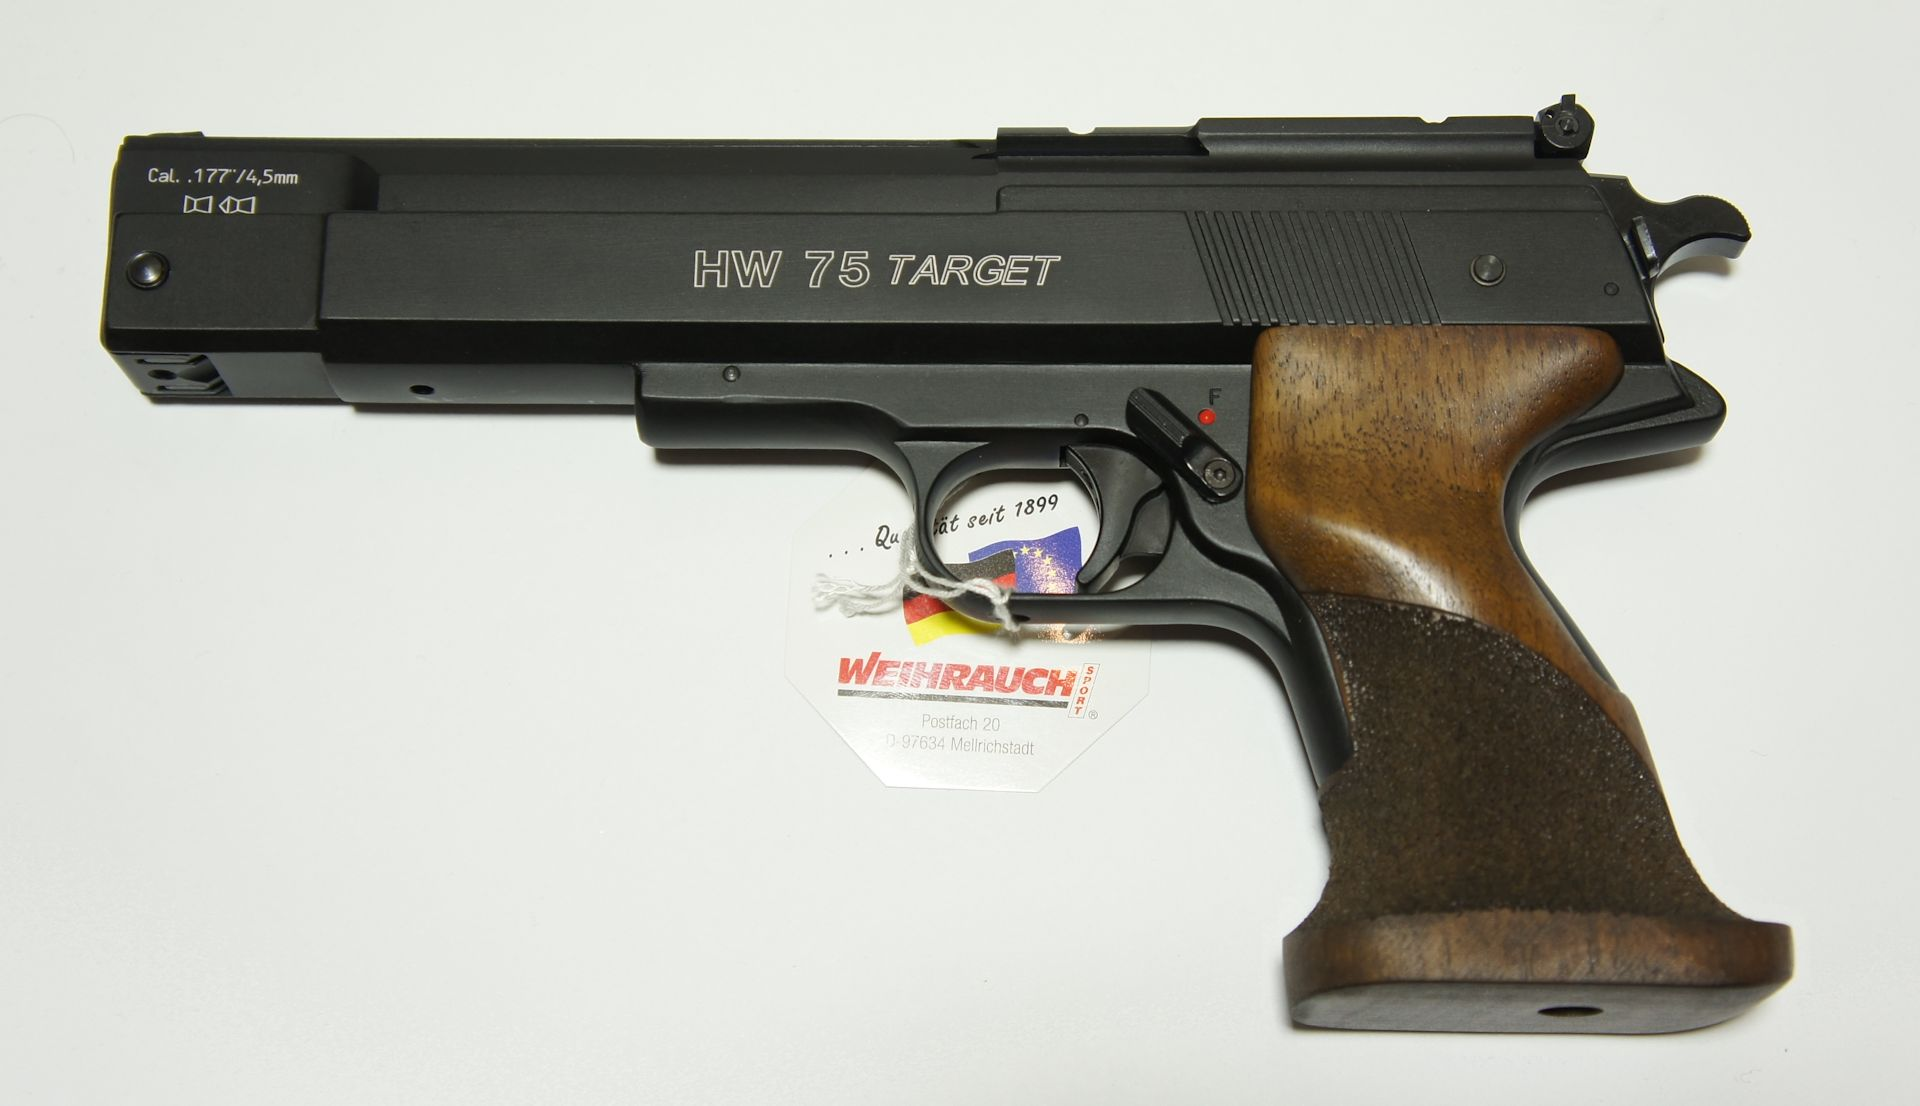 HW 75 Target Kaliber 4,5mm